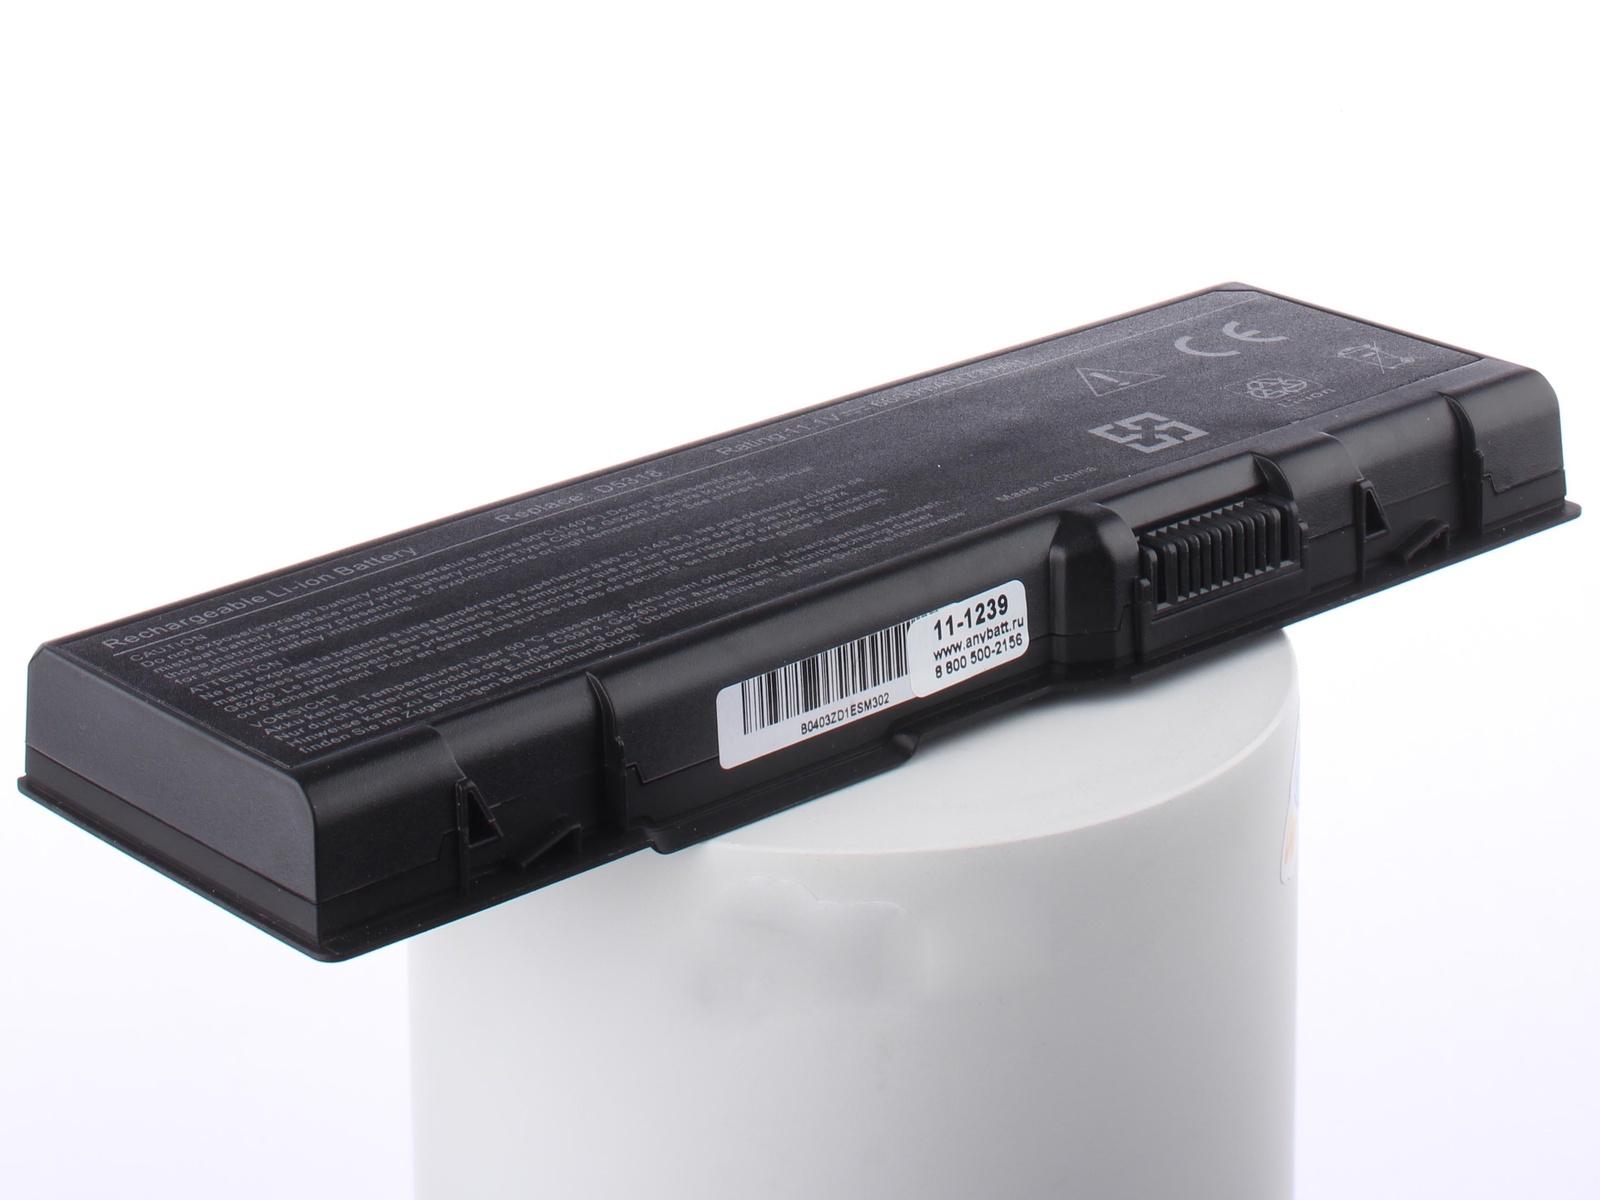 Аккумуляторная батарея AnyBatt 11-A1-1239 6600mAh для ноутбуков Dell D5318, G5260, F5132, U4873, C5974, B-5022, C5447, 312-0349, G5266, цена в Москве и Питере